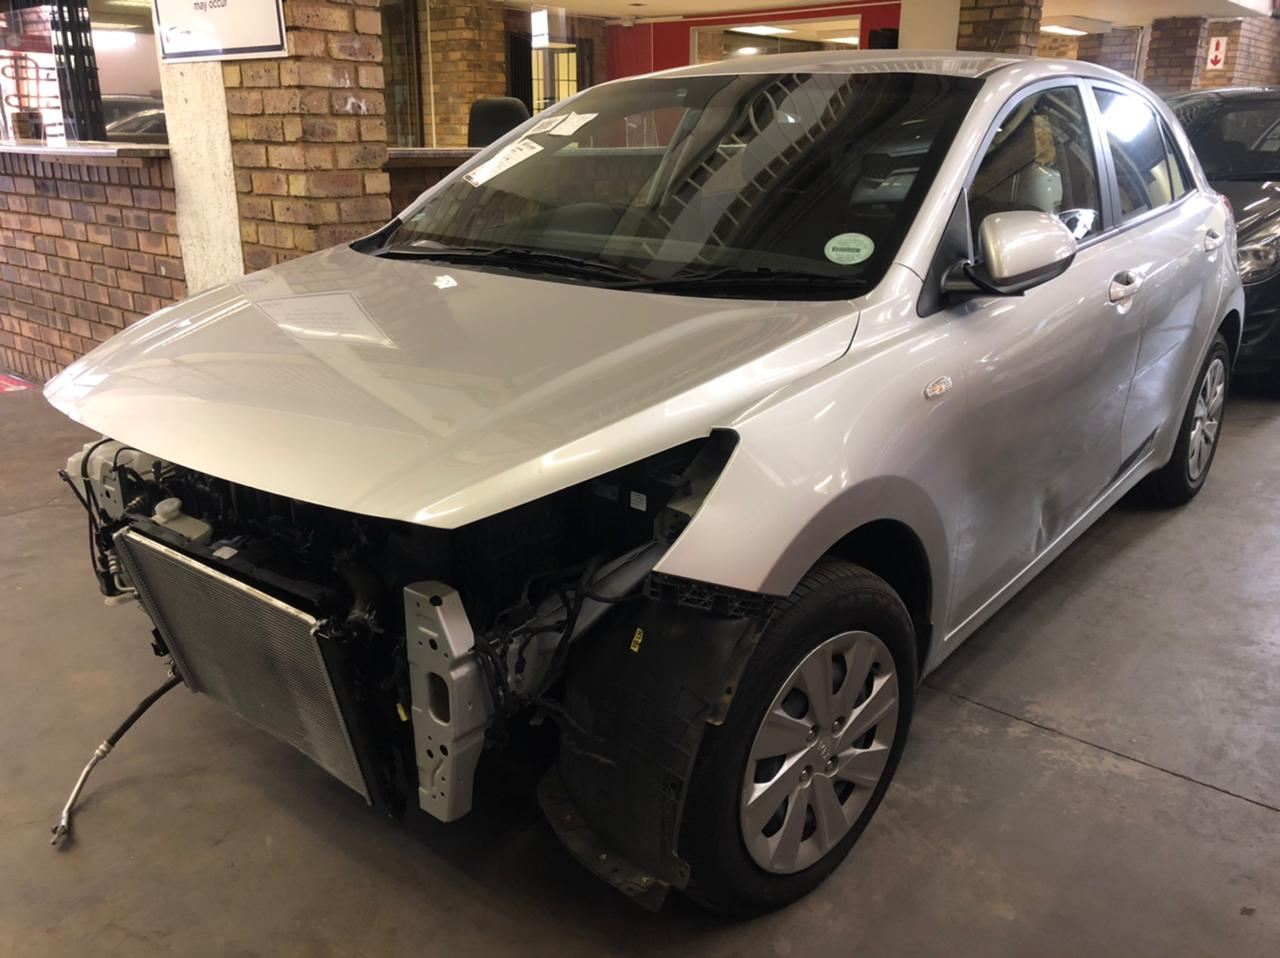 2019 Kia Rio 1.2 Hatch Accident damaged